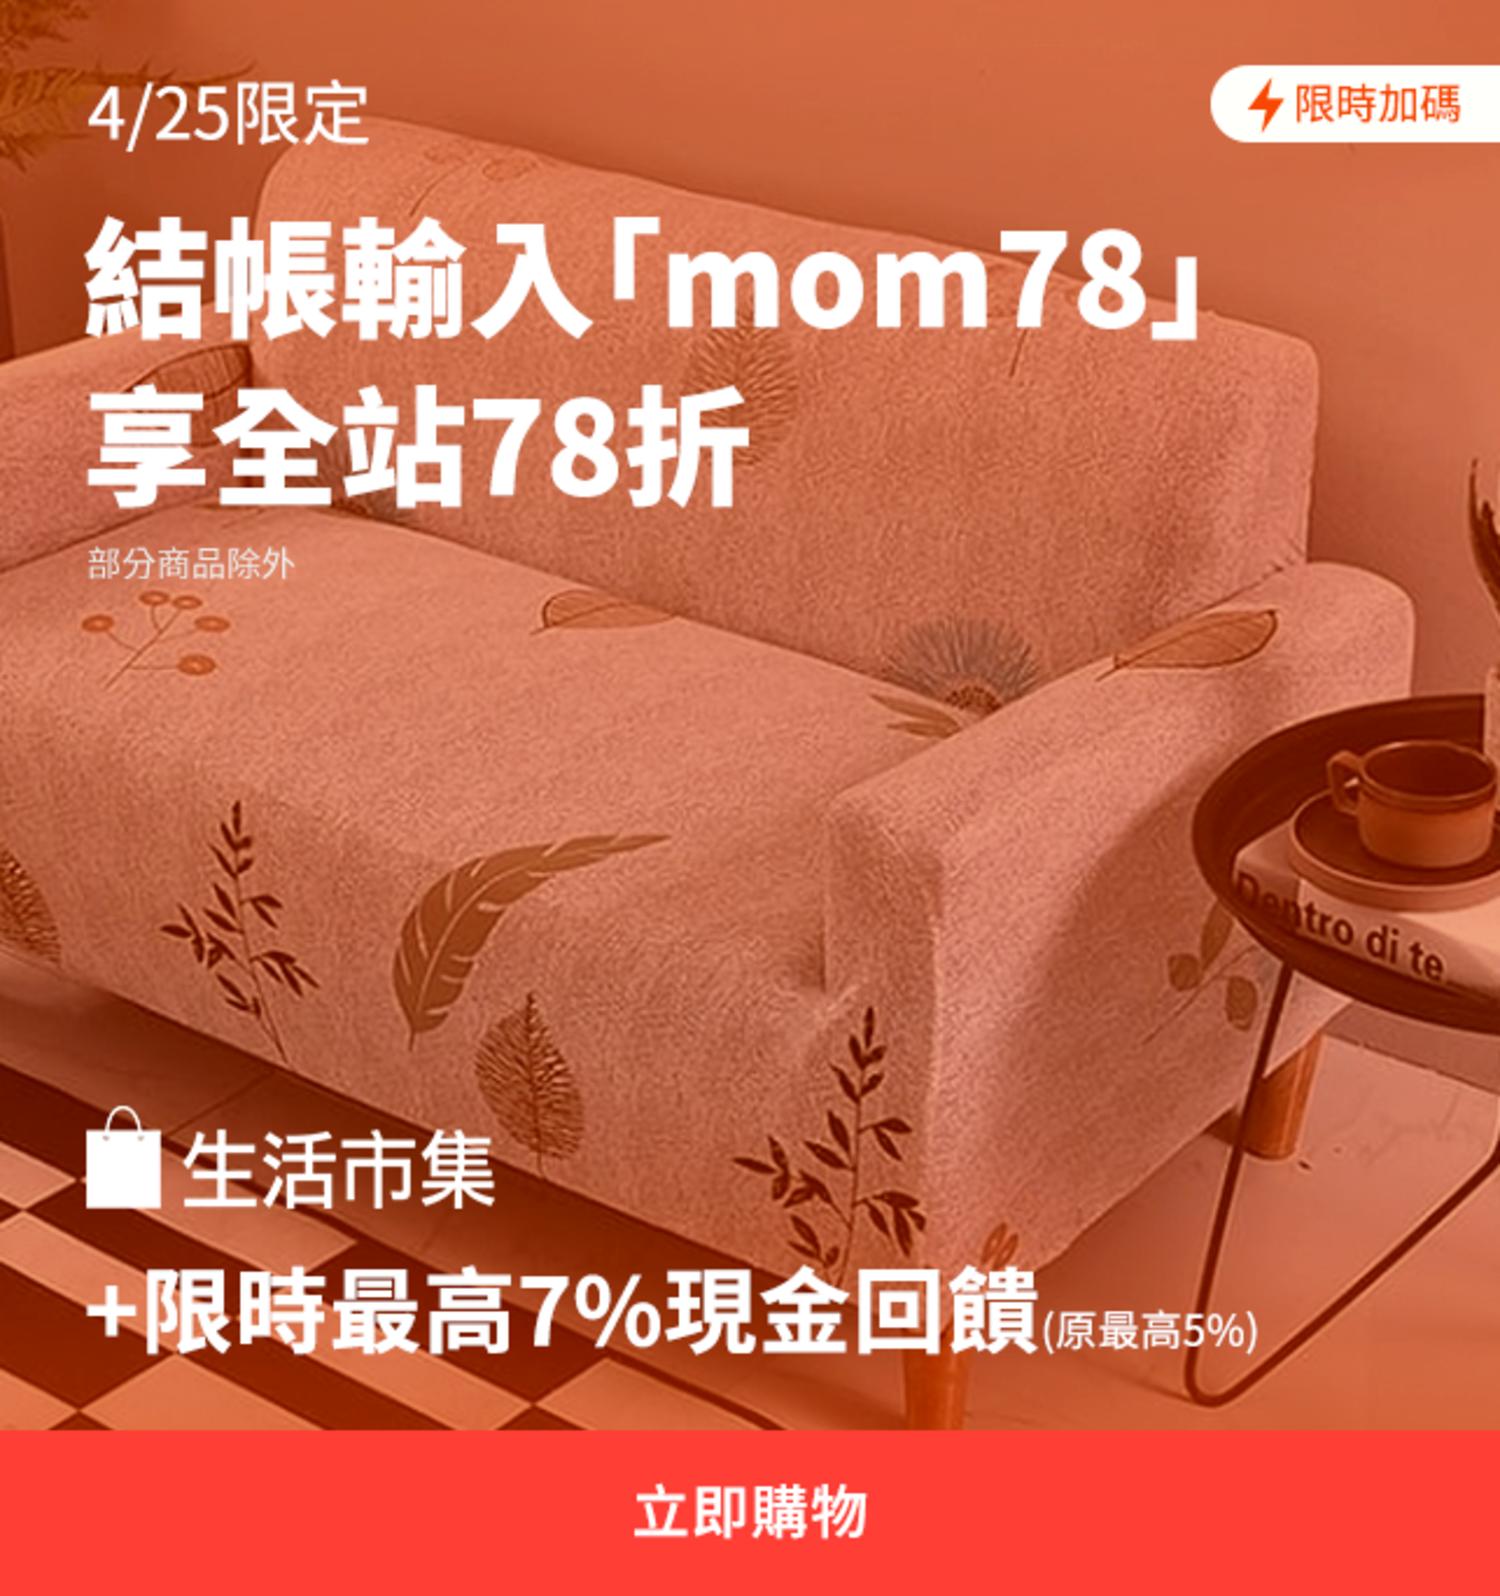 buy123_0425